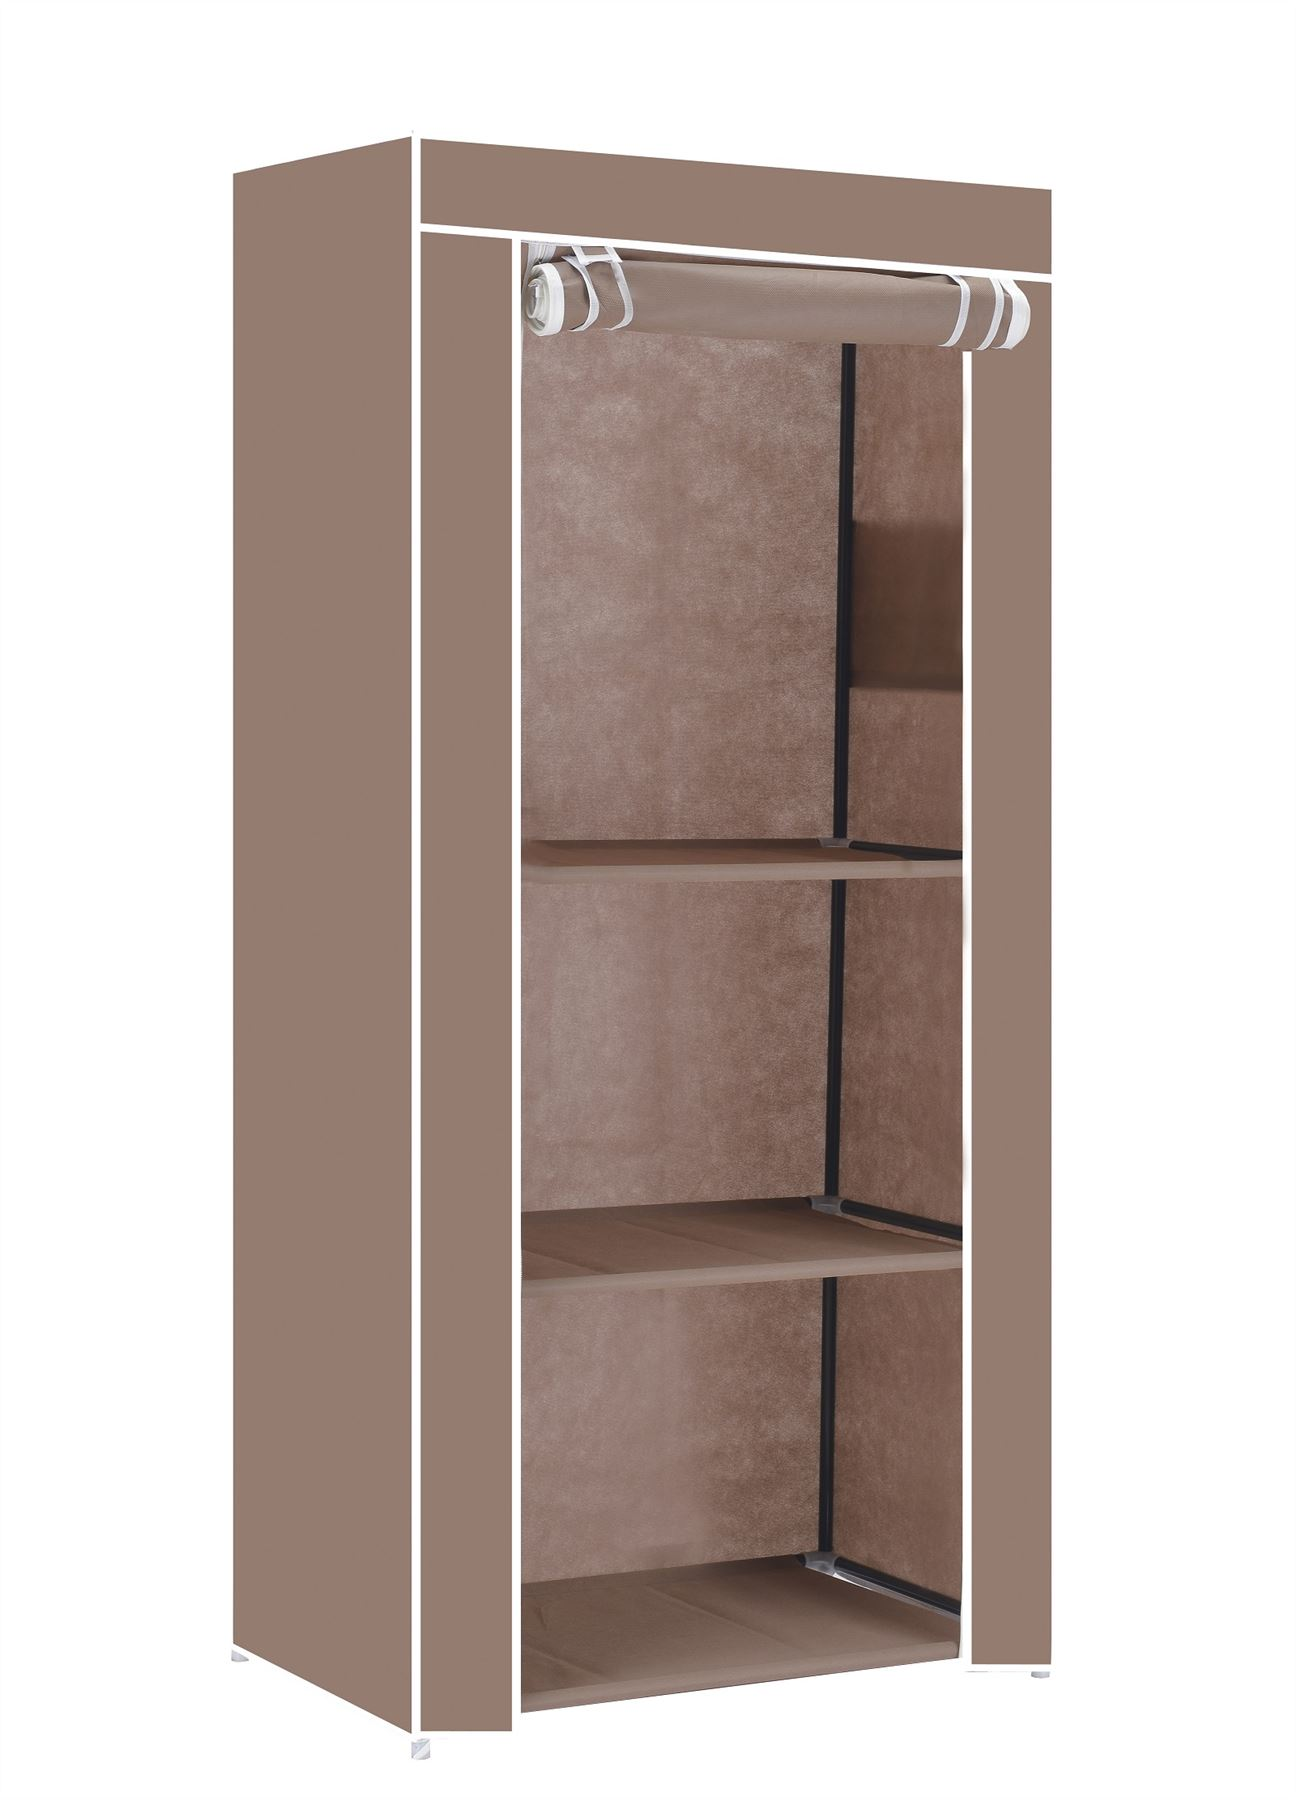 vinsani single wardrobes storage robust lightweight with. Black Bedroom Furniture Sets. Home Design Ideas